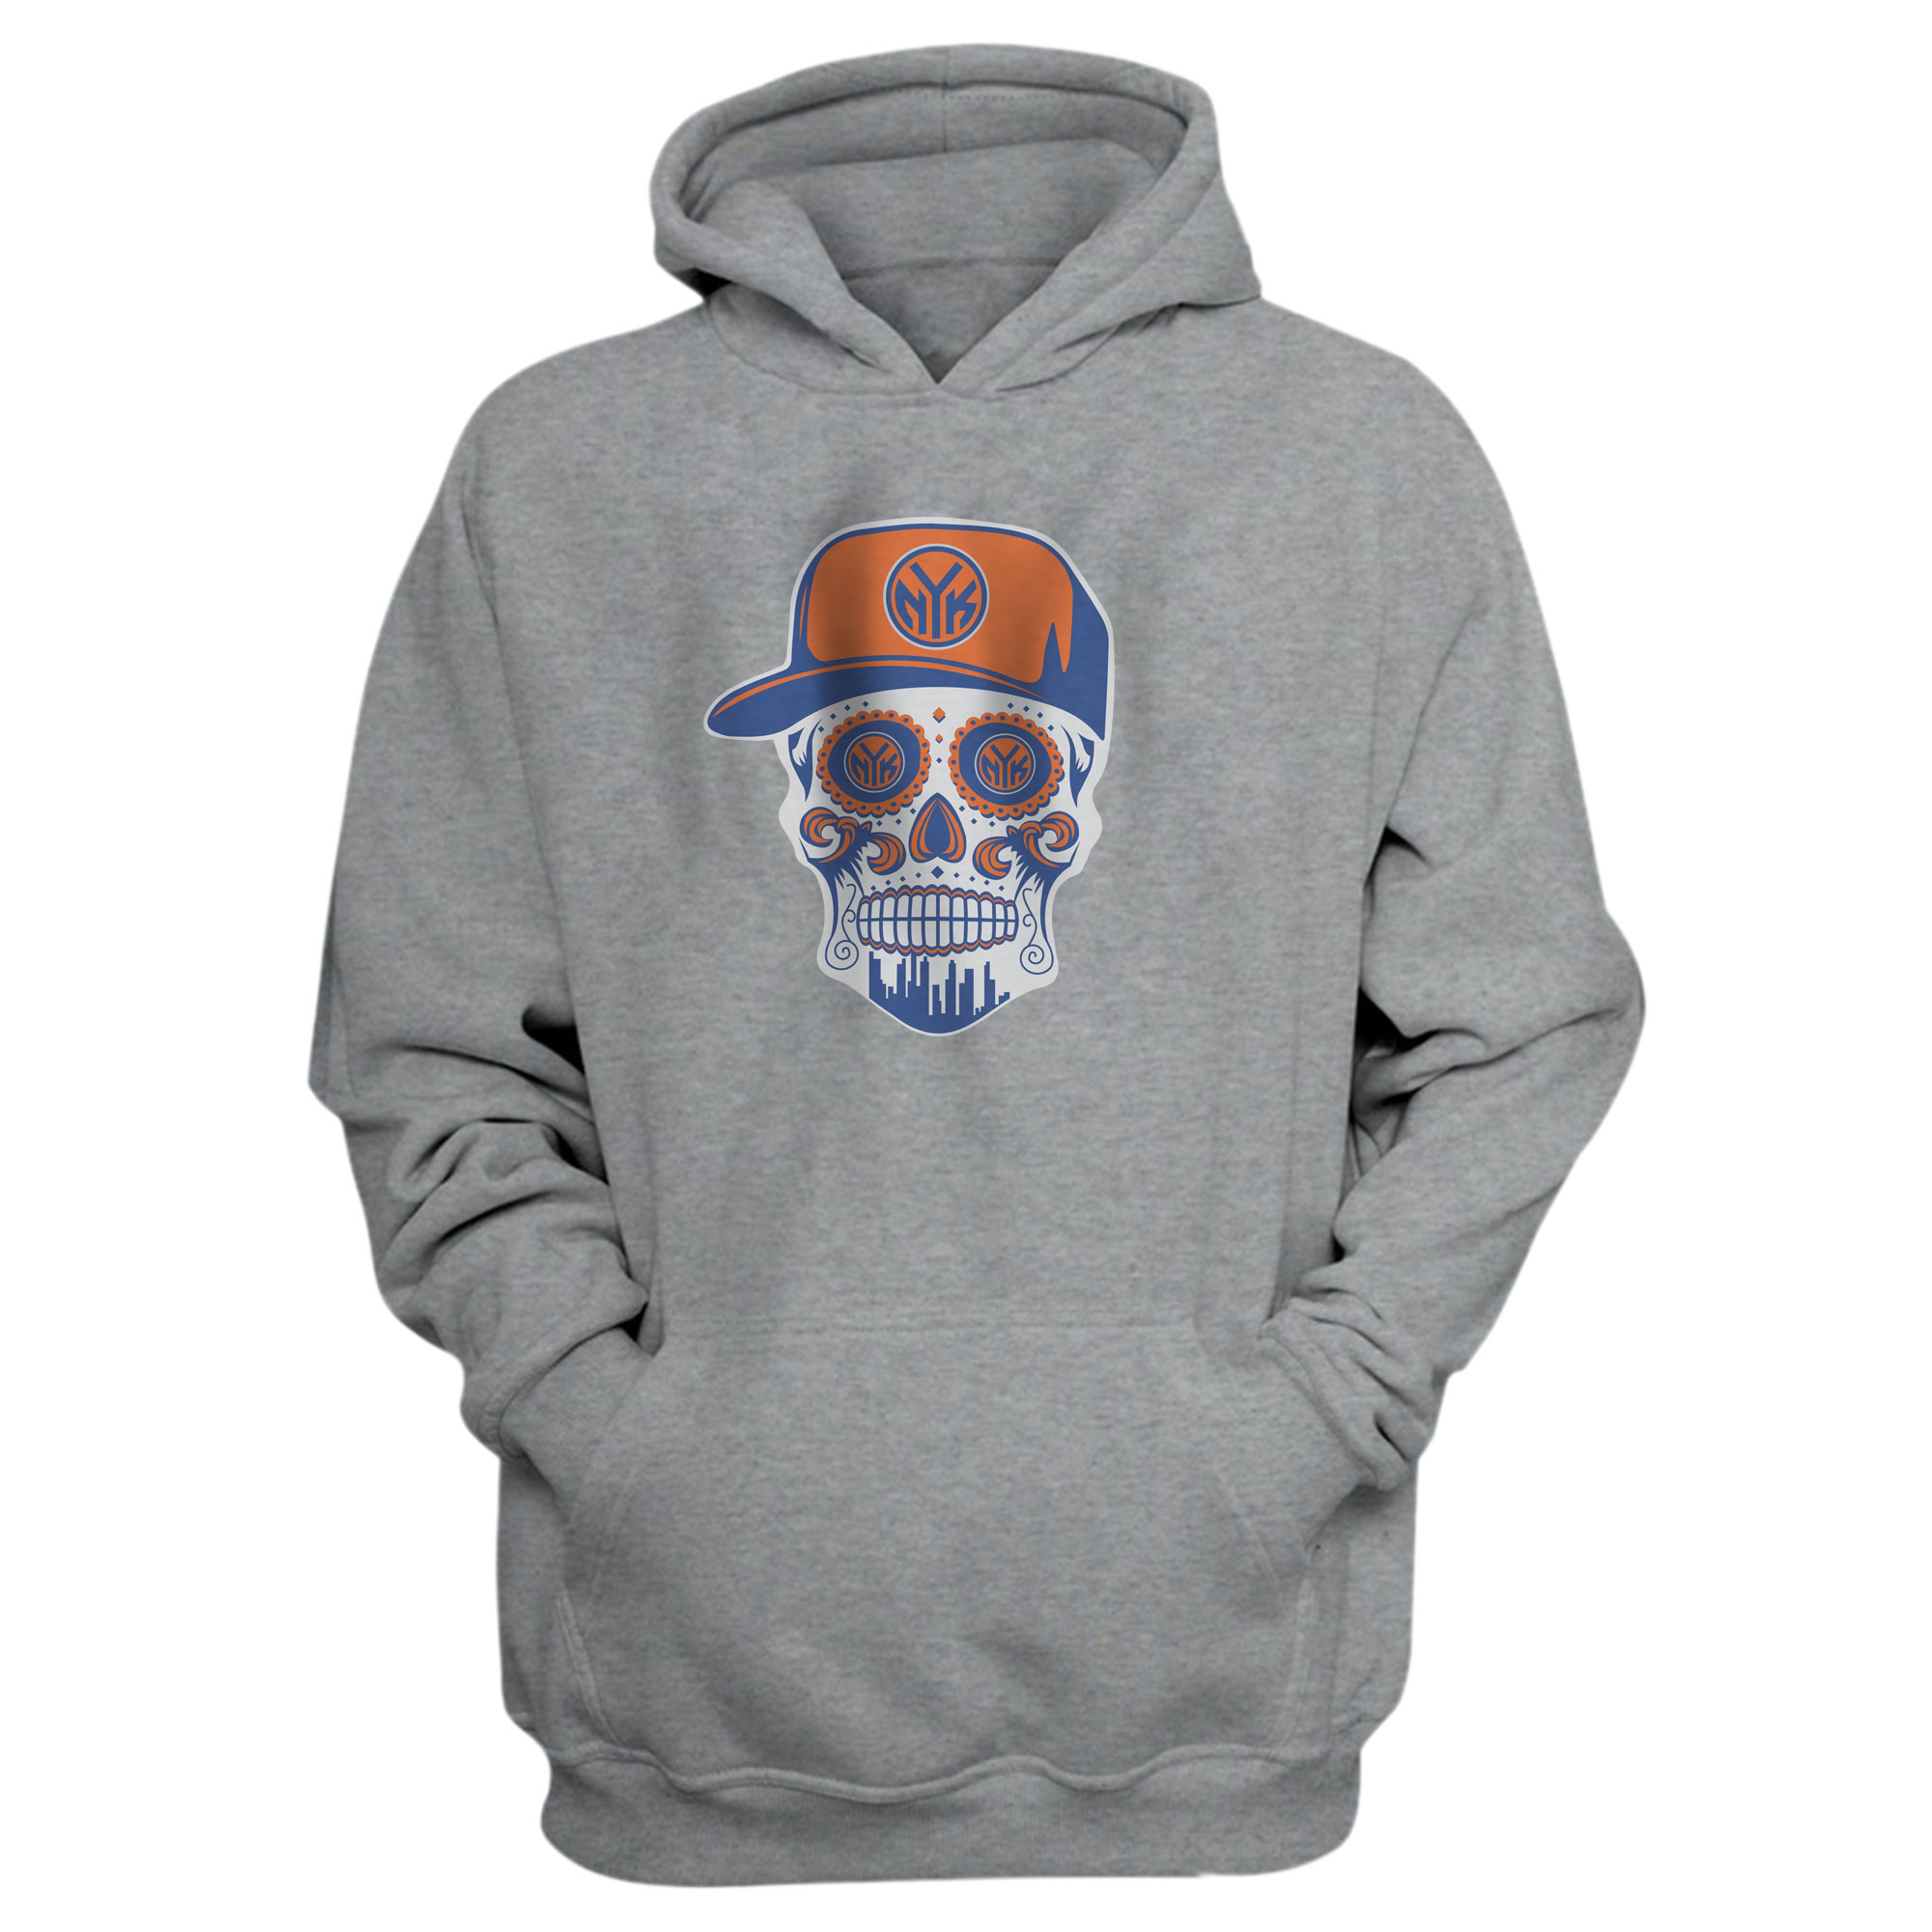 Knicks Skull Hoodie (HD-GRY-NP-NBA-458-NYK-SKULL)